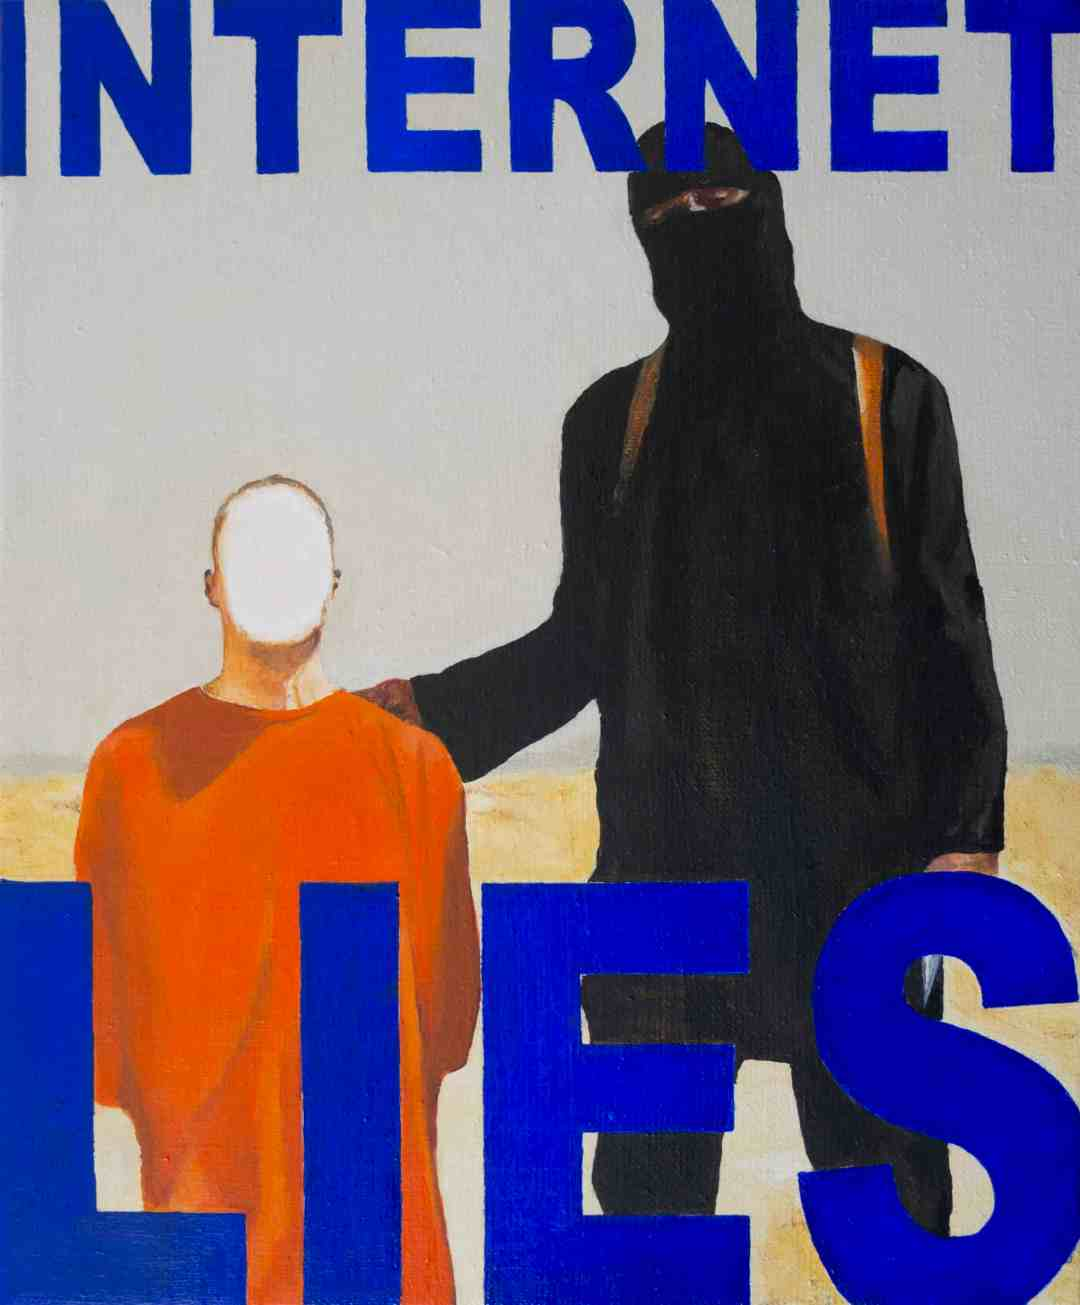 Wiktor Dyndo, INTERNET LIES 08, 40 x 33 cm, oil on canvas, 2014